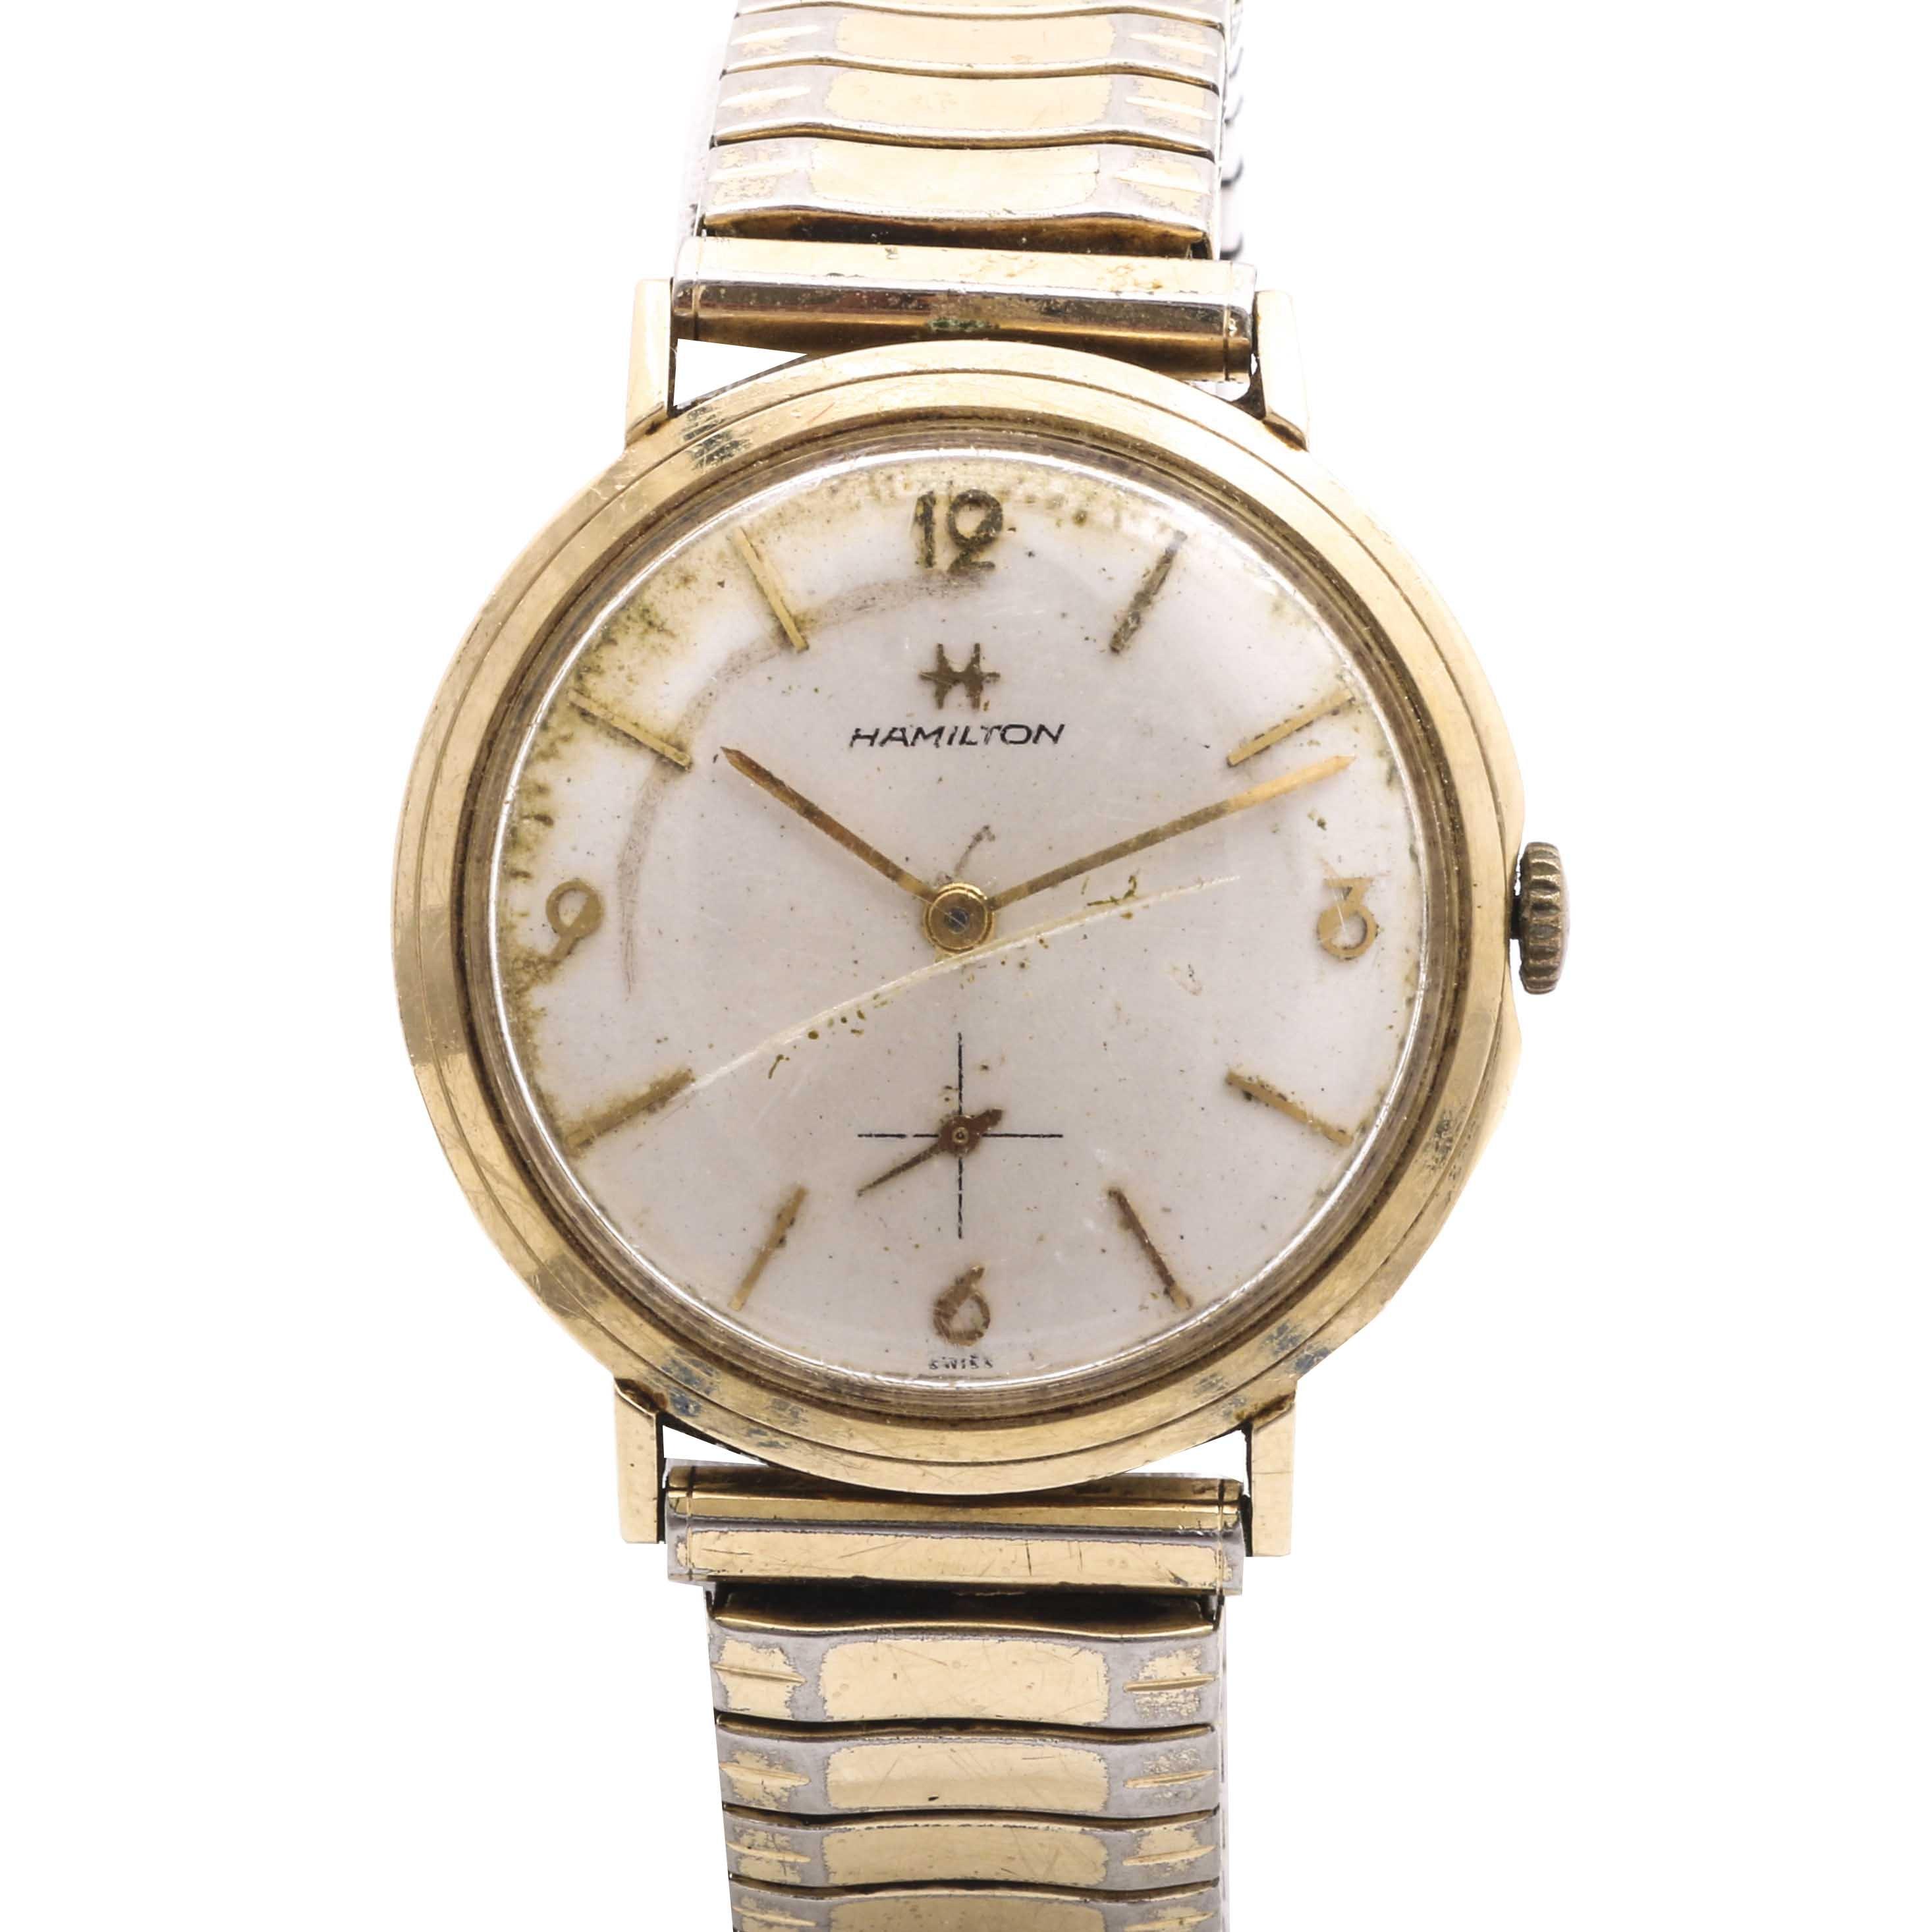 Hamilton 14K Yellow Gold Expansion Wristwatch